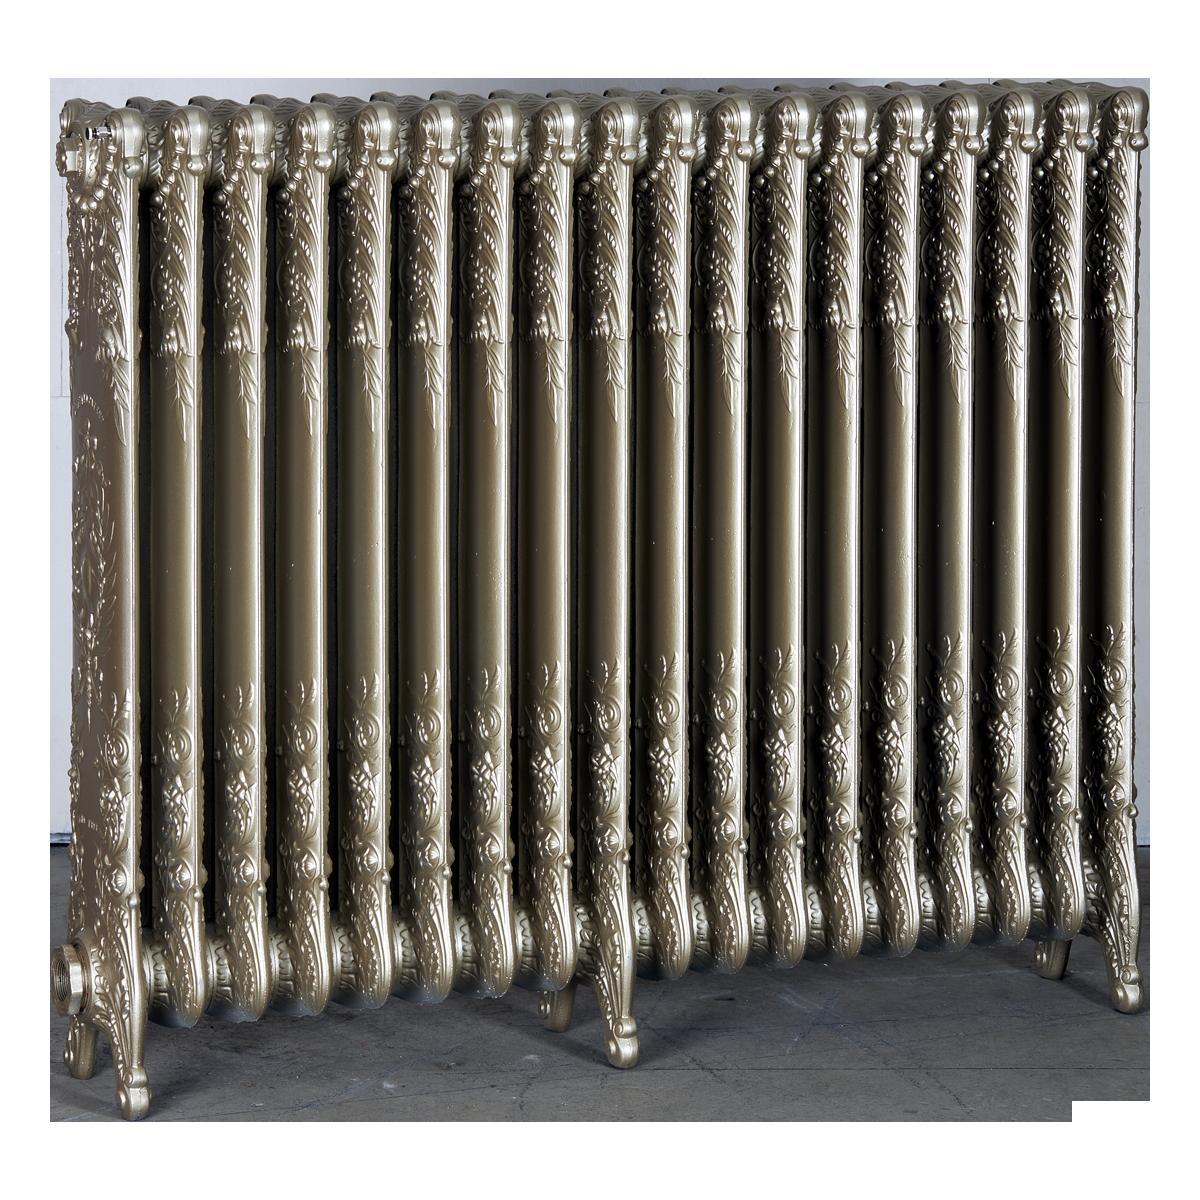 Ironworks Radiators Inc. refurbished cast iron radiator Hope in Champagne metallic